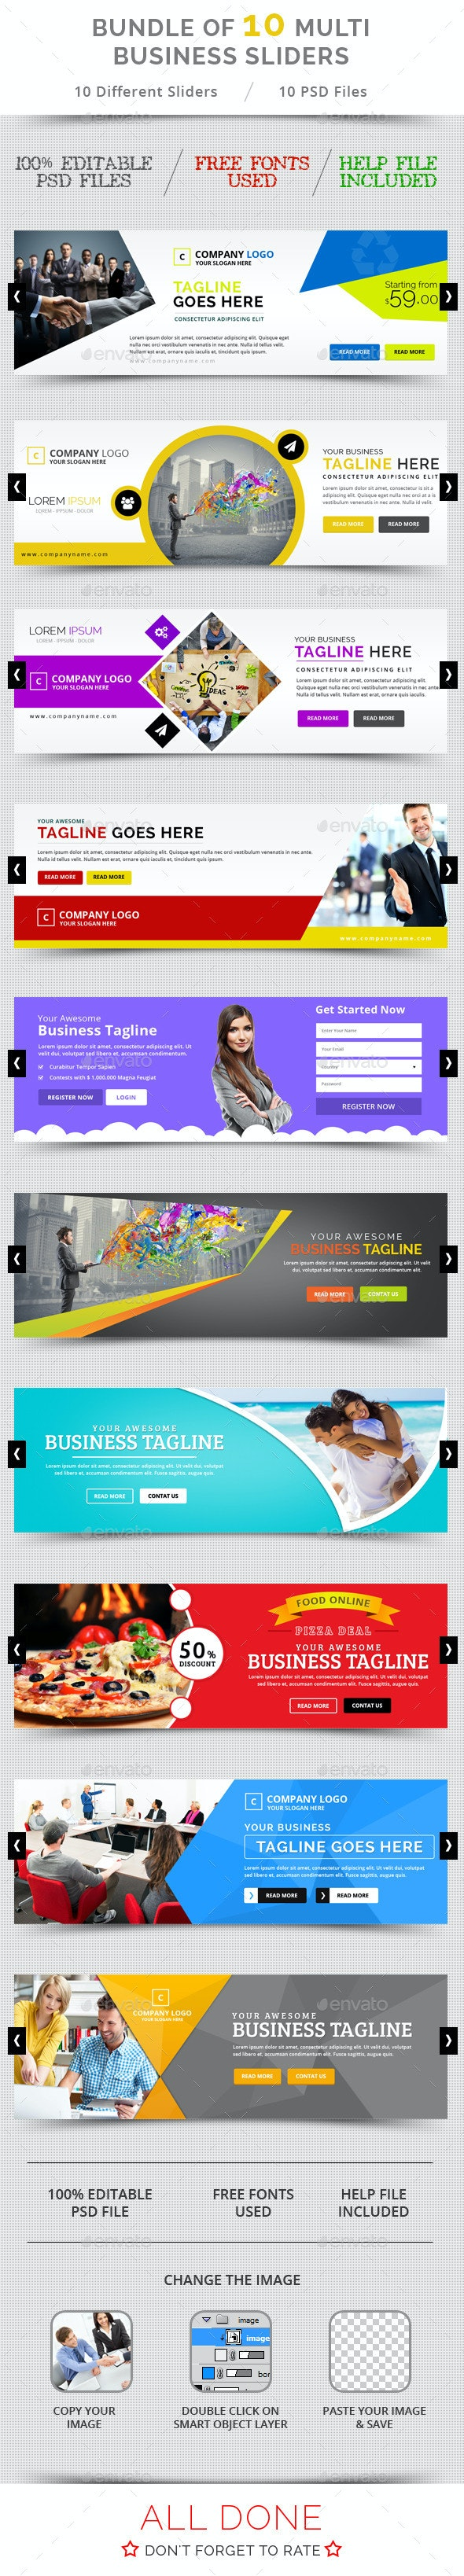 Bundle of 10 Multi Business Sliders - Sliders & Features Web Elements